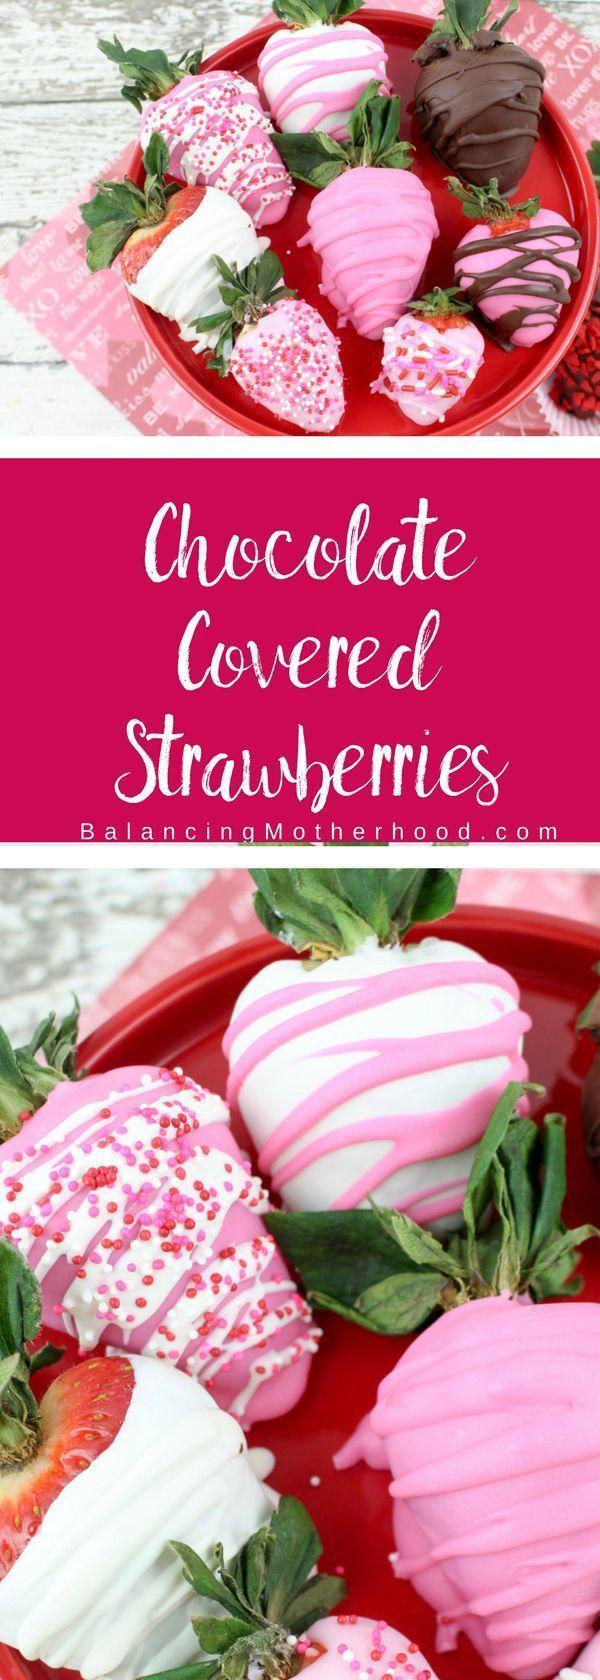 Photo of Chocolate Covered Strawberries  